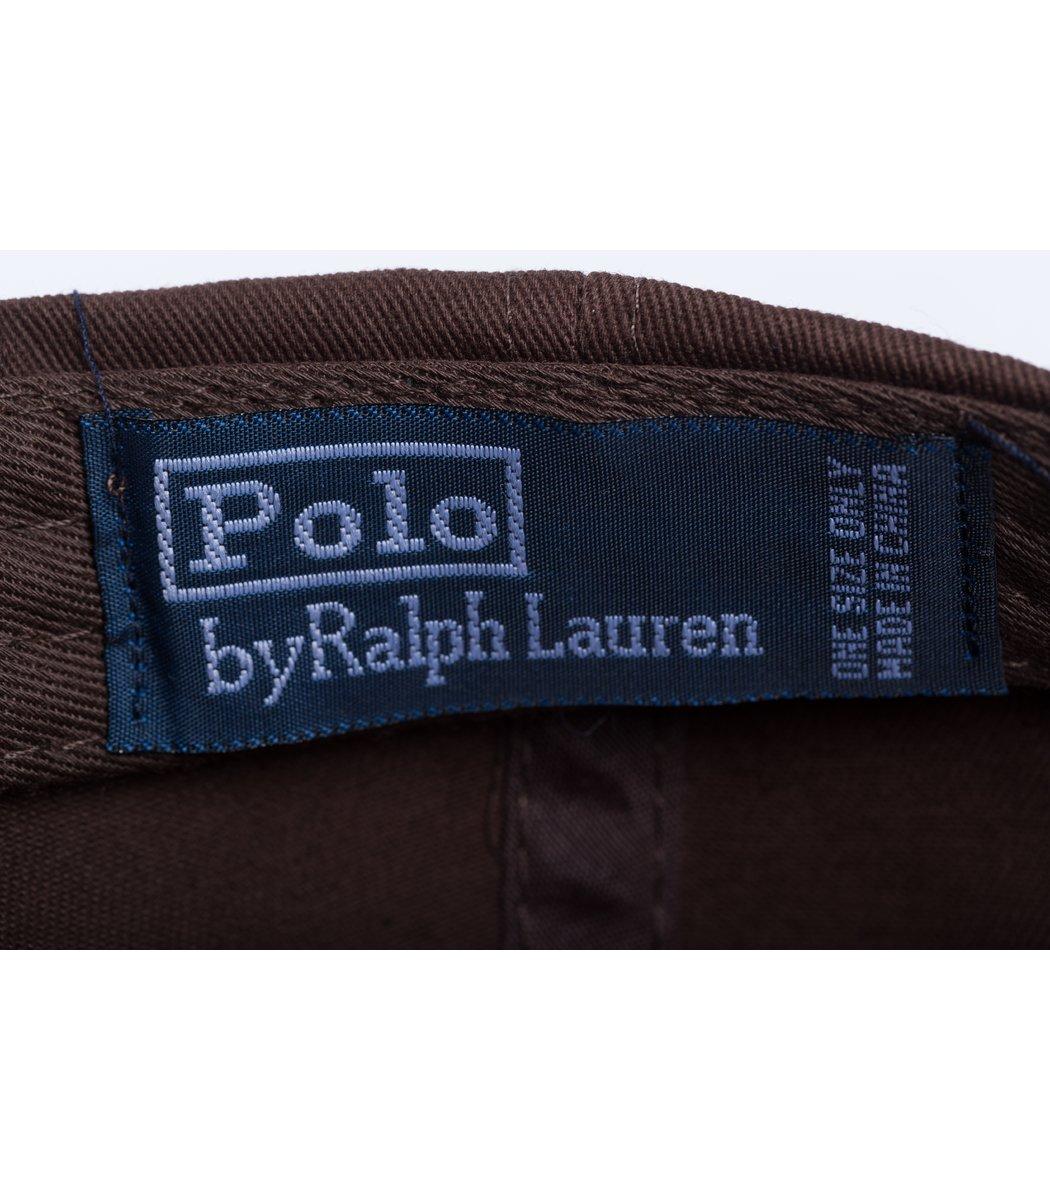 Кепка POLO Ralph Lauren Premiere Коричневый/синий - Коричневый - Вид 4